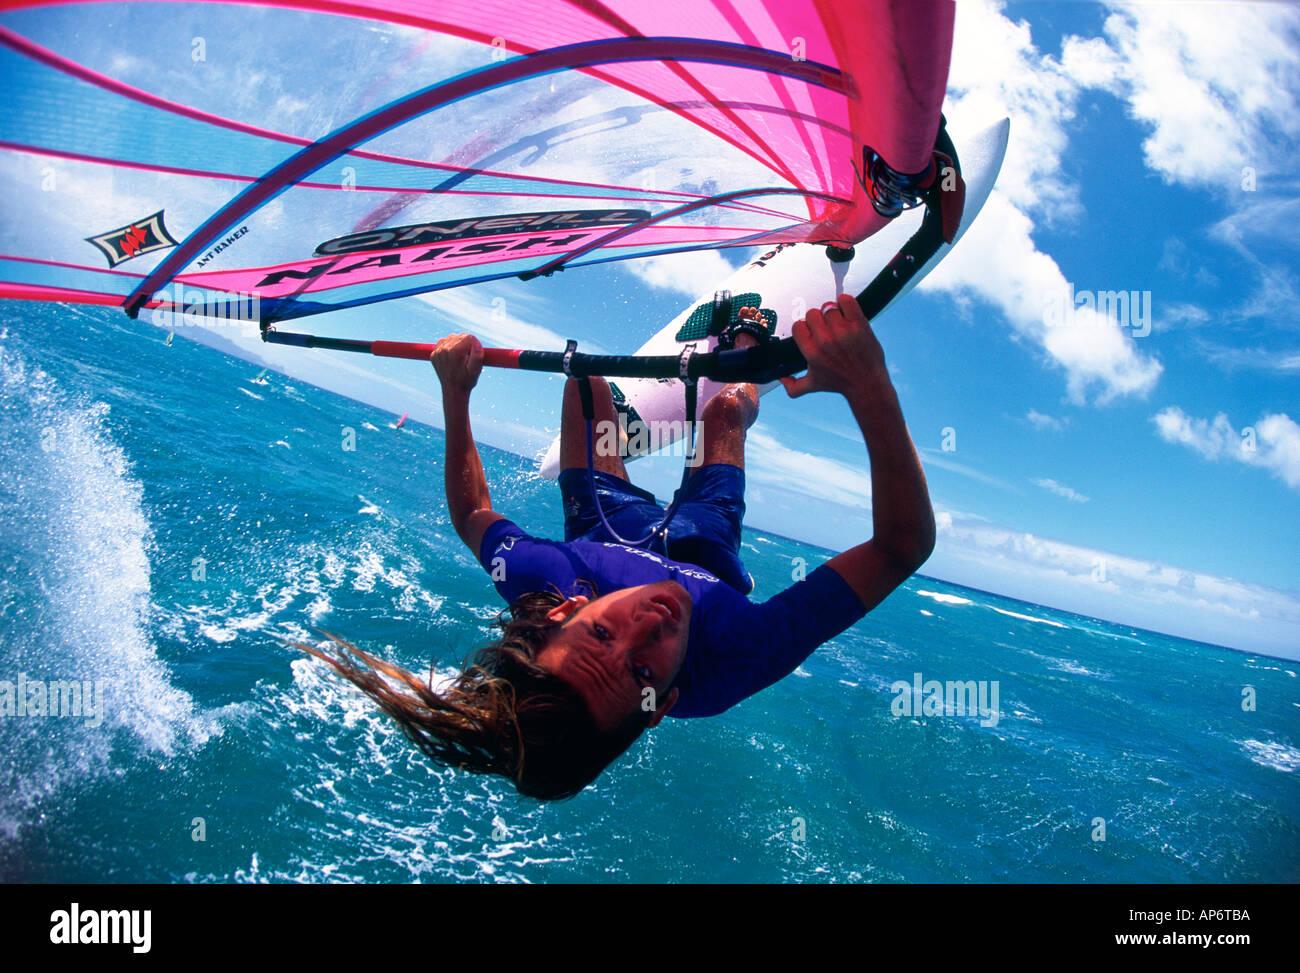 Windsurfer horizontally in the air sail shot jump face sea surf - Stock Image